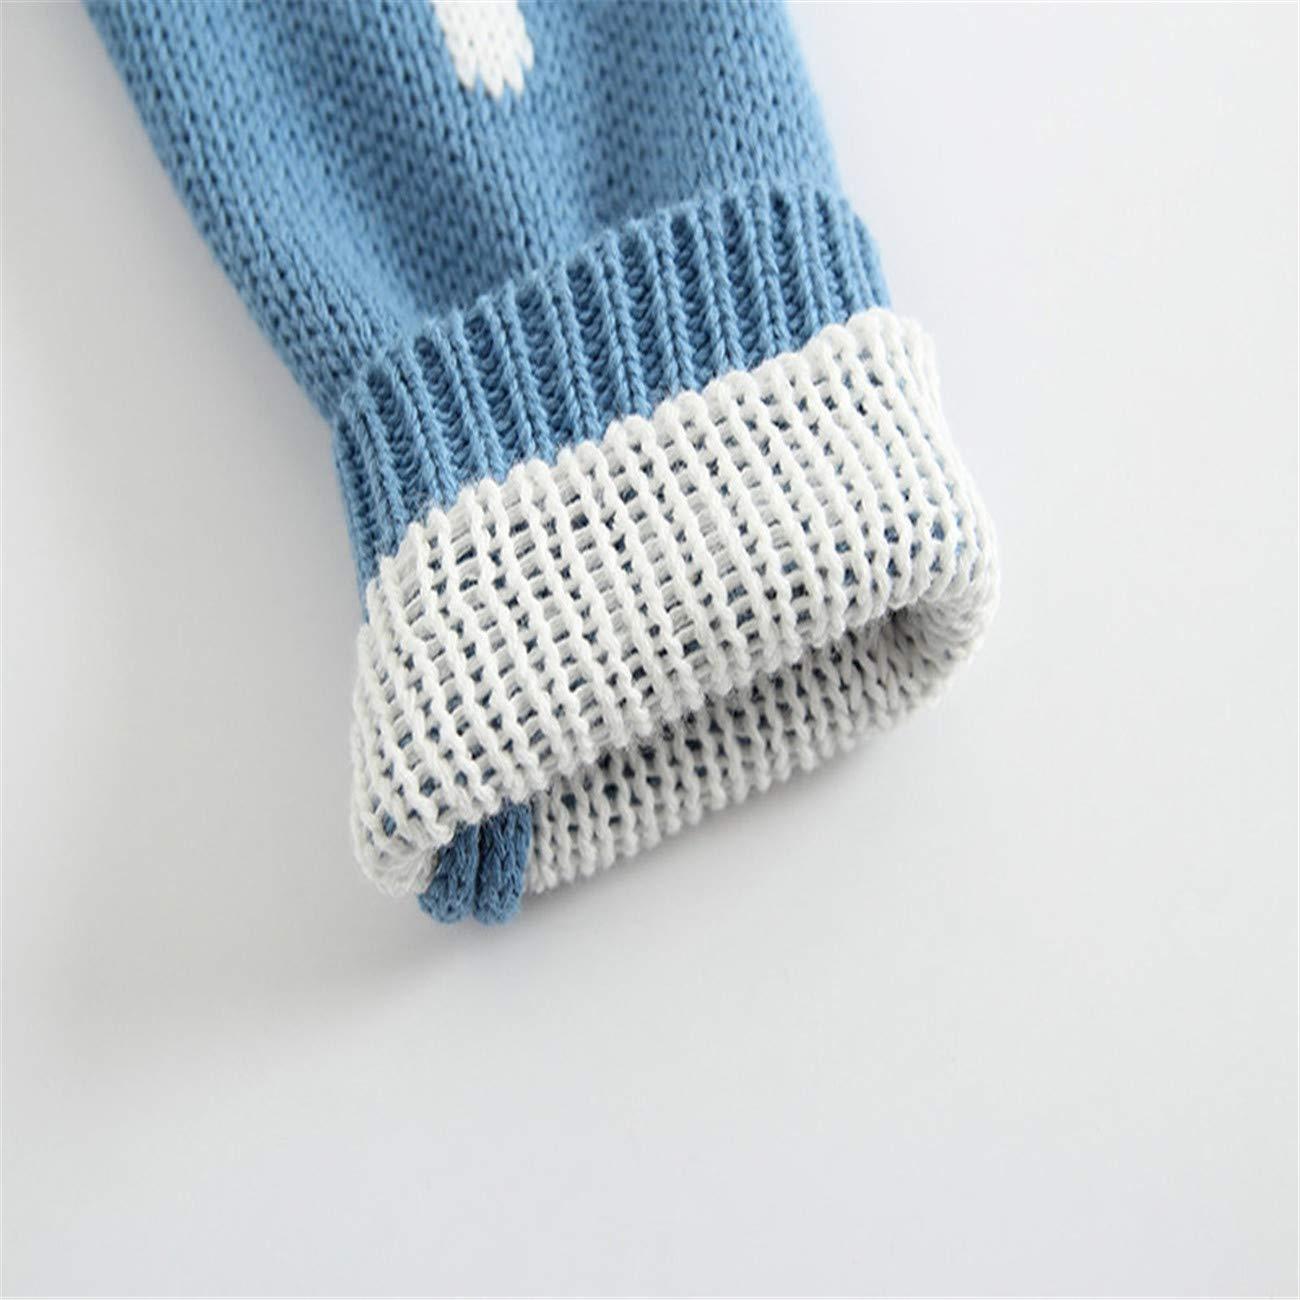 HCFKJ Ropa Bebe NiñA Invierno NiñO Manga Larga Camisetas Beb Conjuntos Moda Bebé ReciéN Nacido NiñO Chico NiñA Dot Punto Mameluco Body Ropa Crochet Trajes: ...